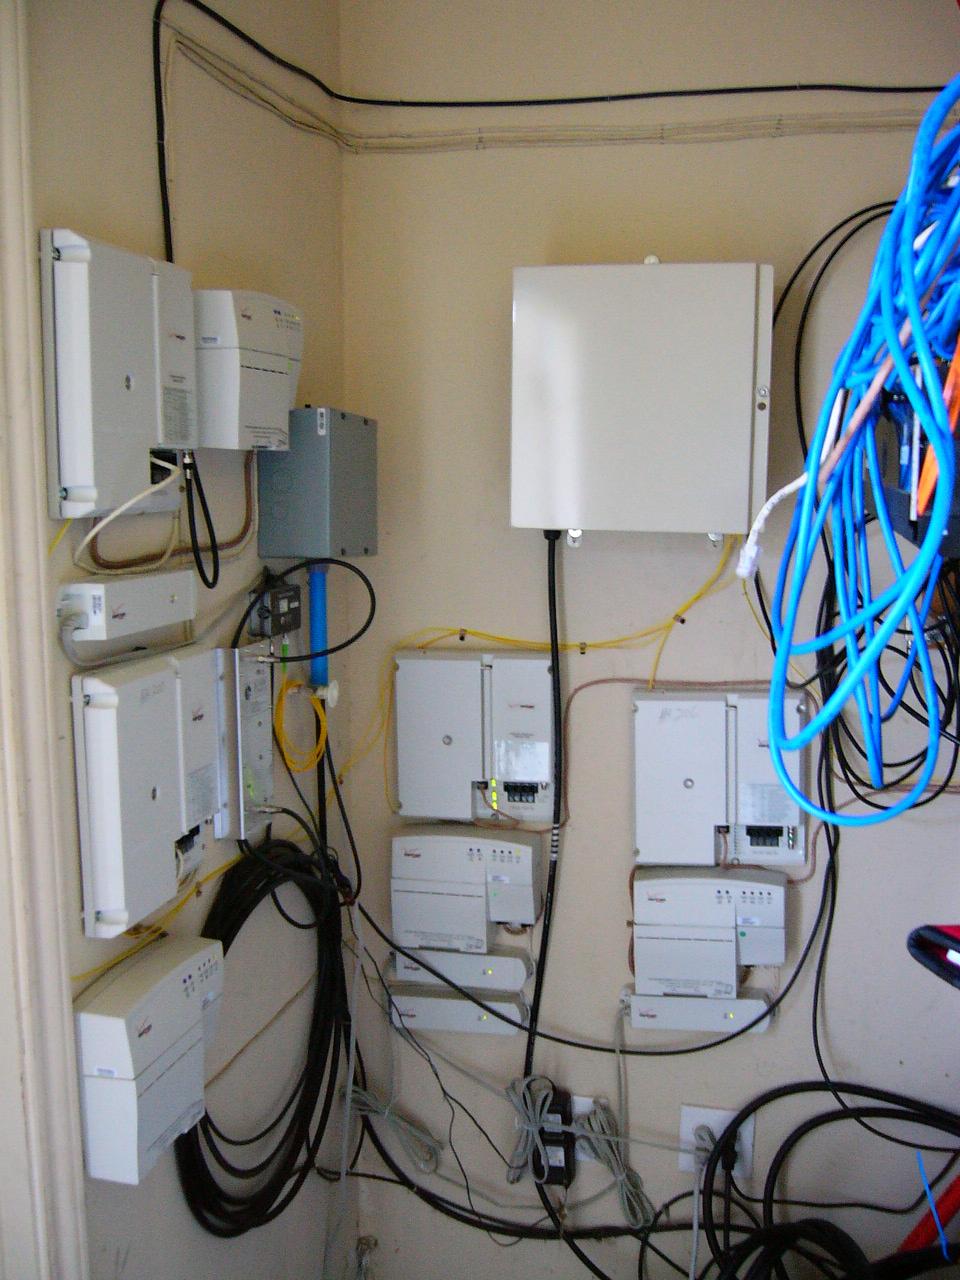 Bsoho Vz Fttp Tutorial Demarc Box Wiring Diagram Tellabs 611i Sfu Pic 1 Unit Installed In Garden Style Mdu